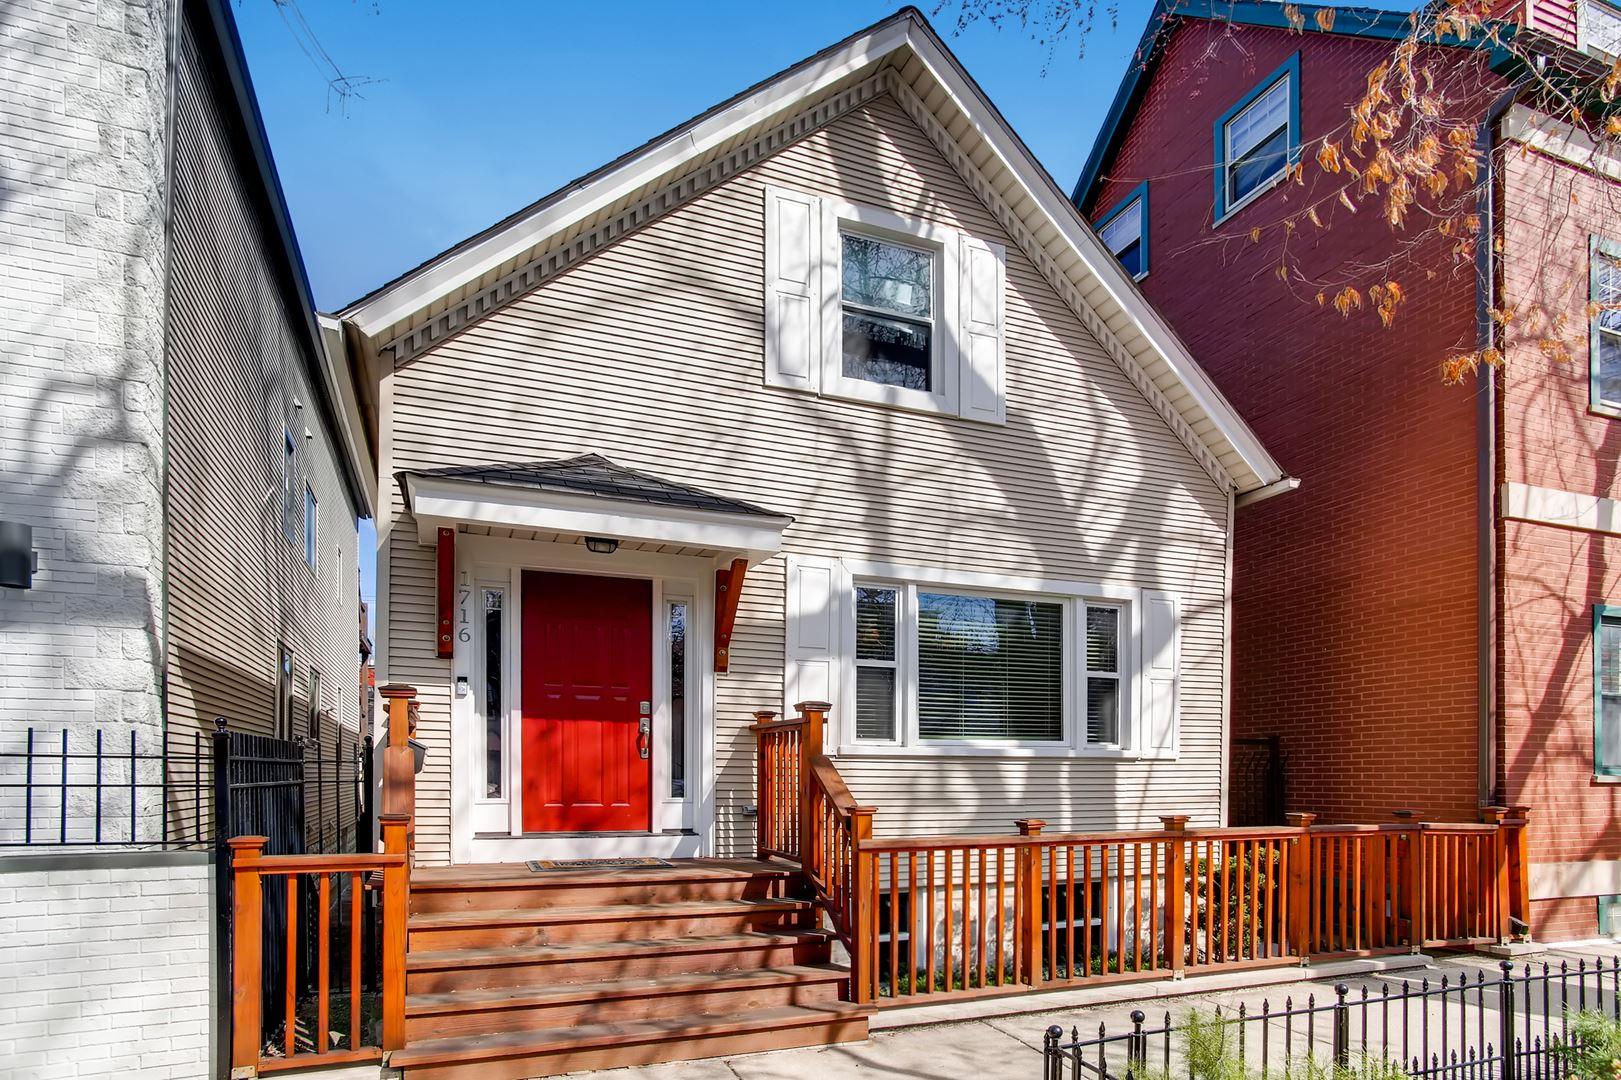 1716 W Altgeld Street, Chicago, IL 60614 - #: 10639168